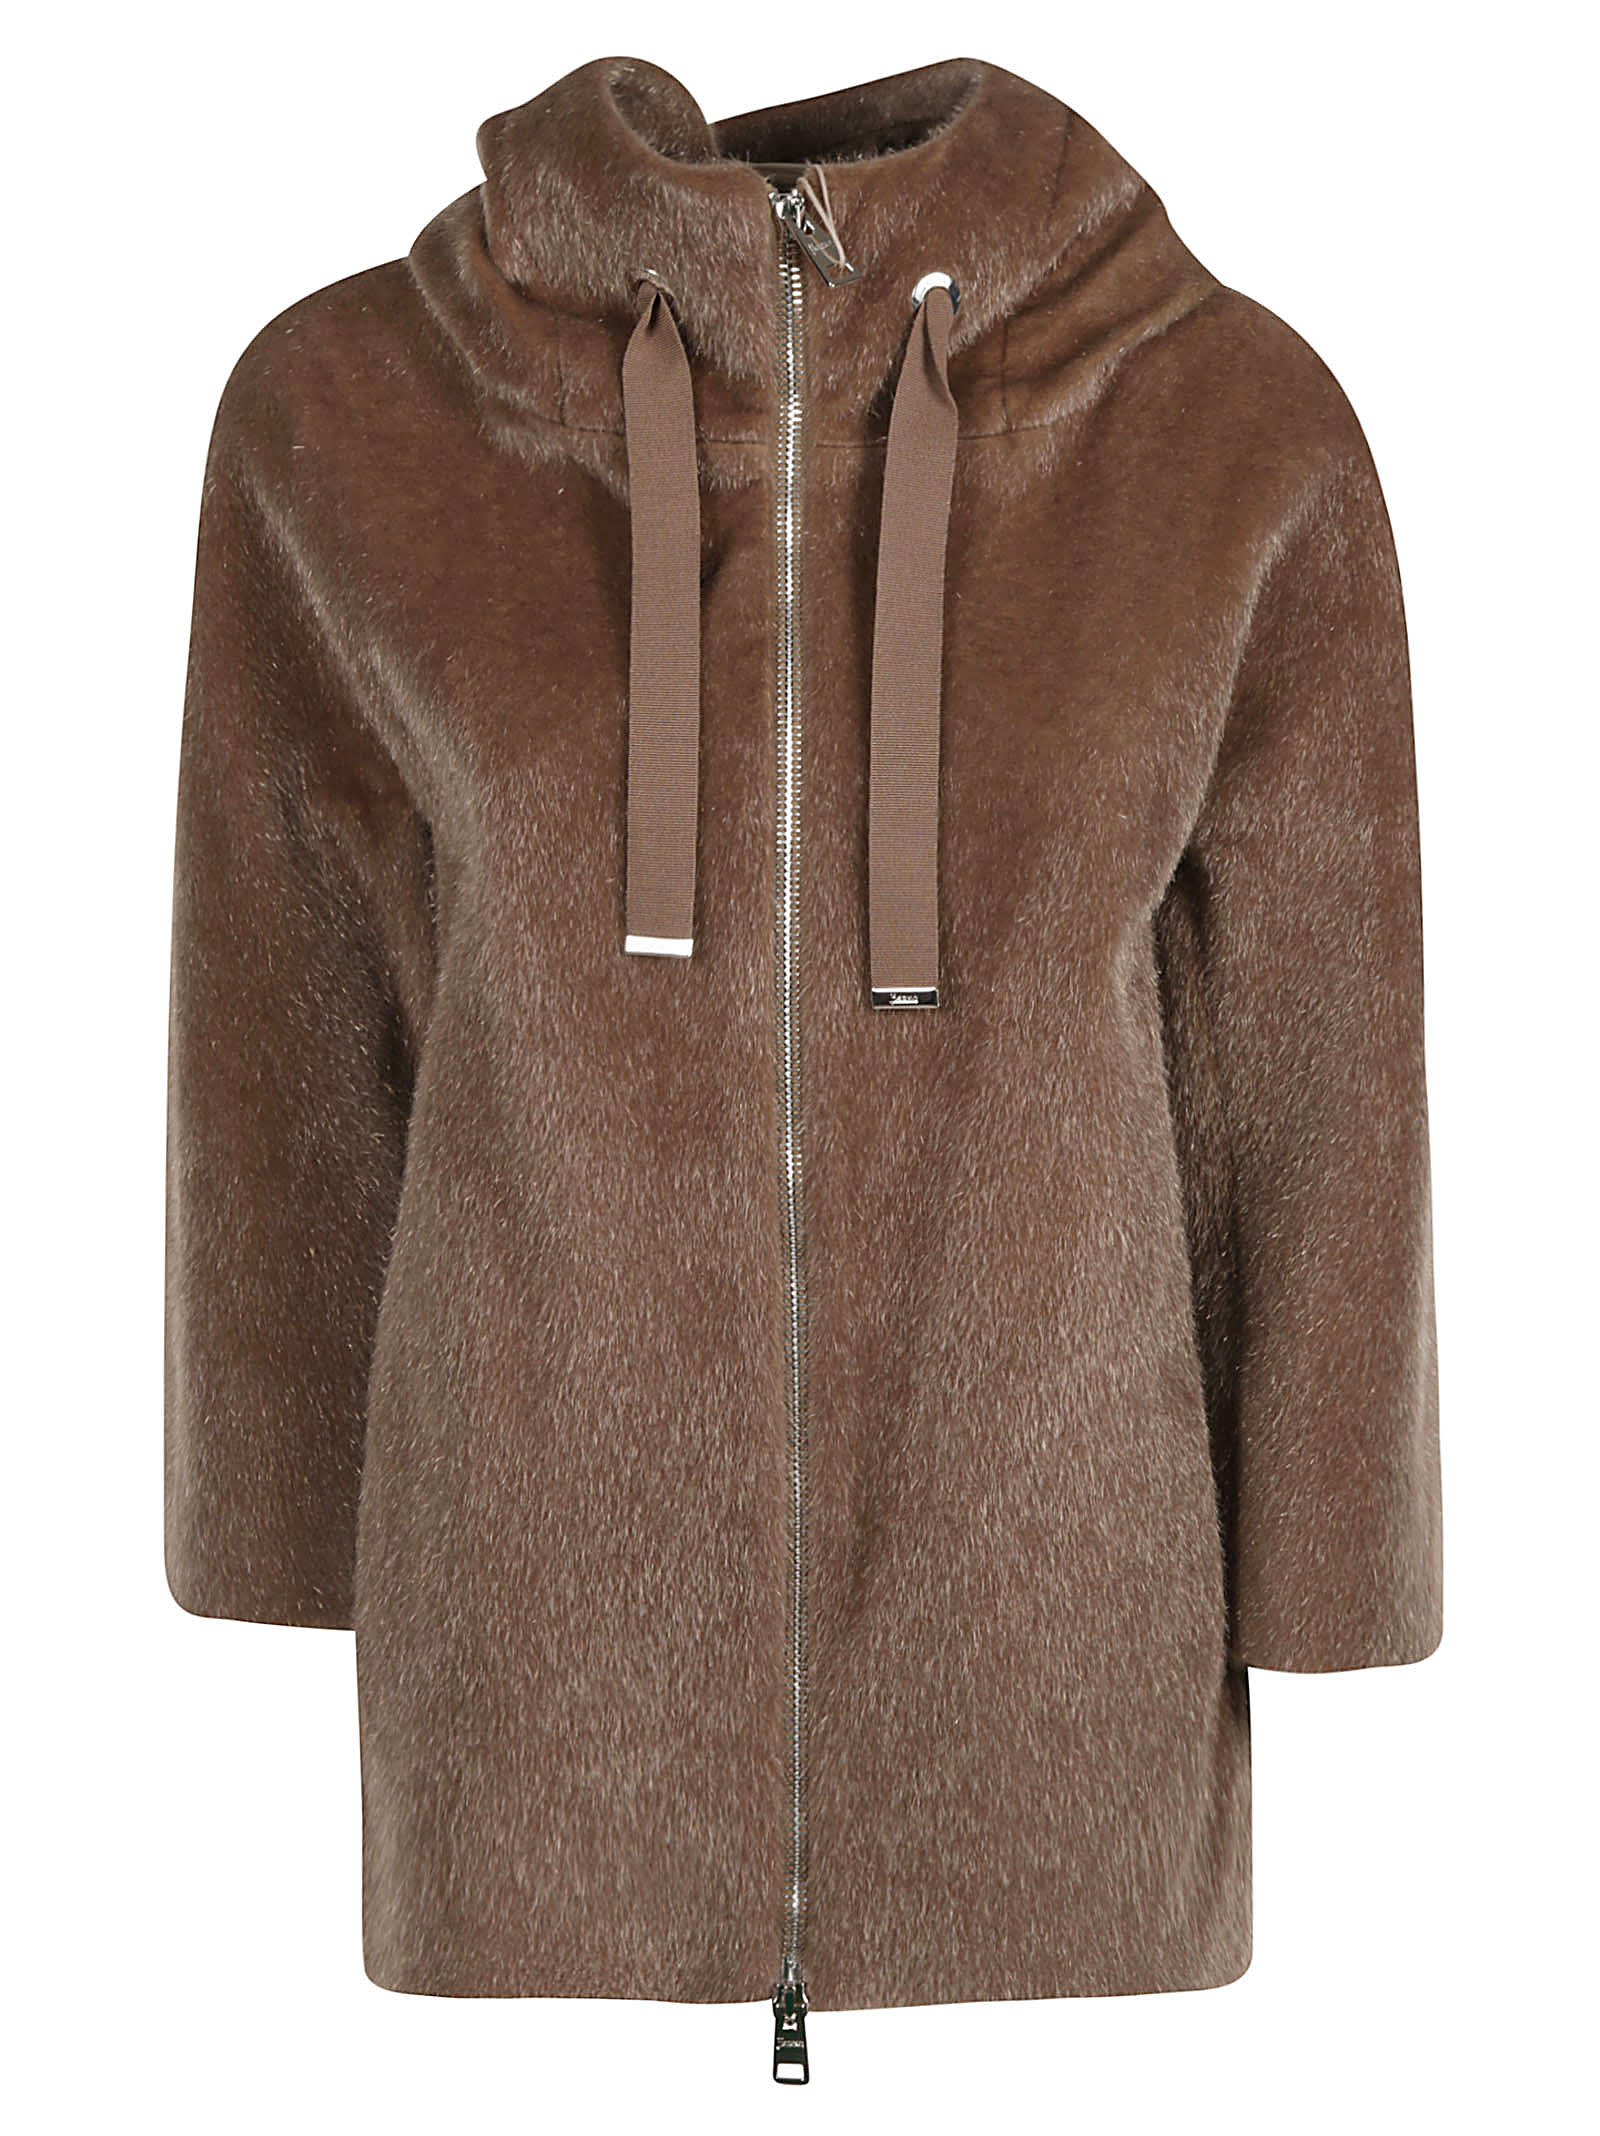 Herno Fur-coated Zipped Jacket